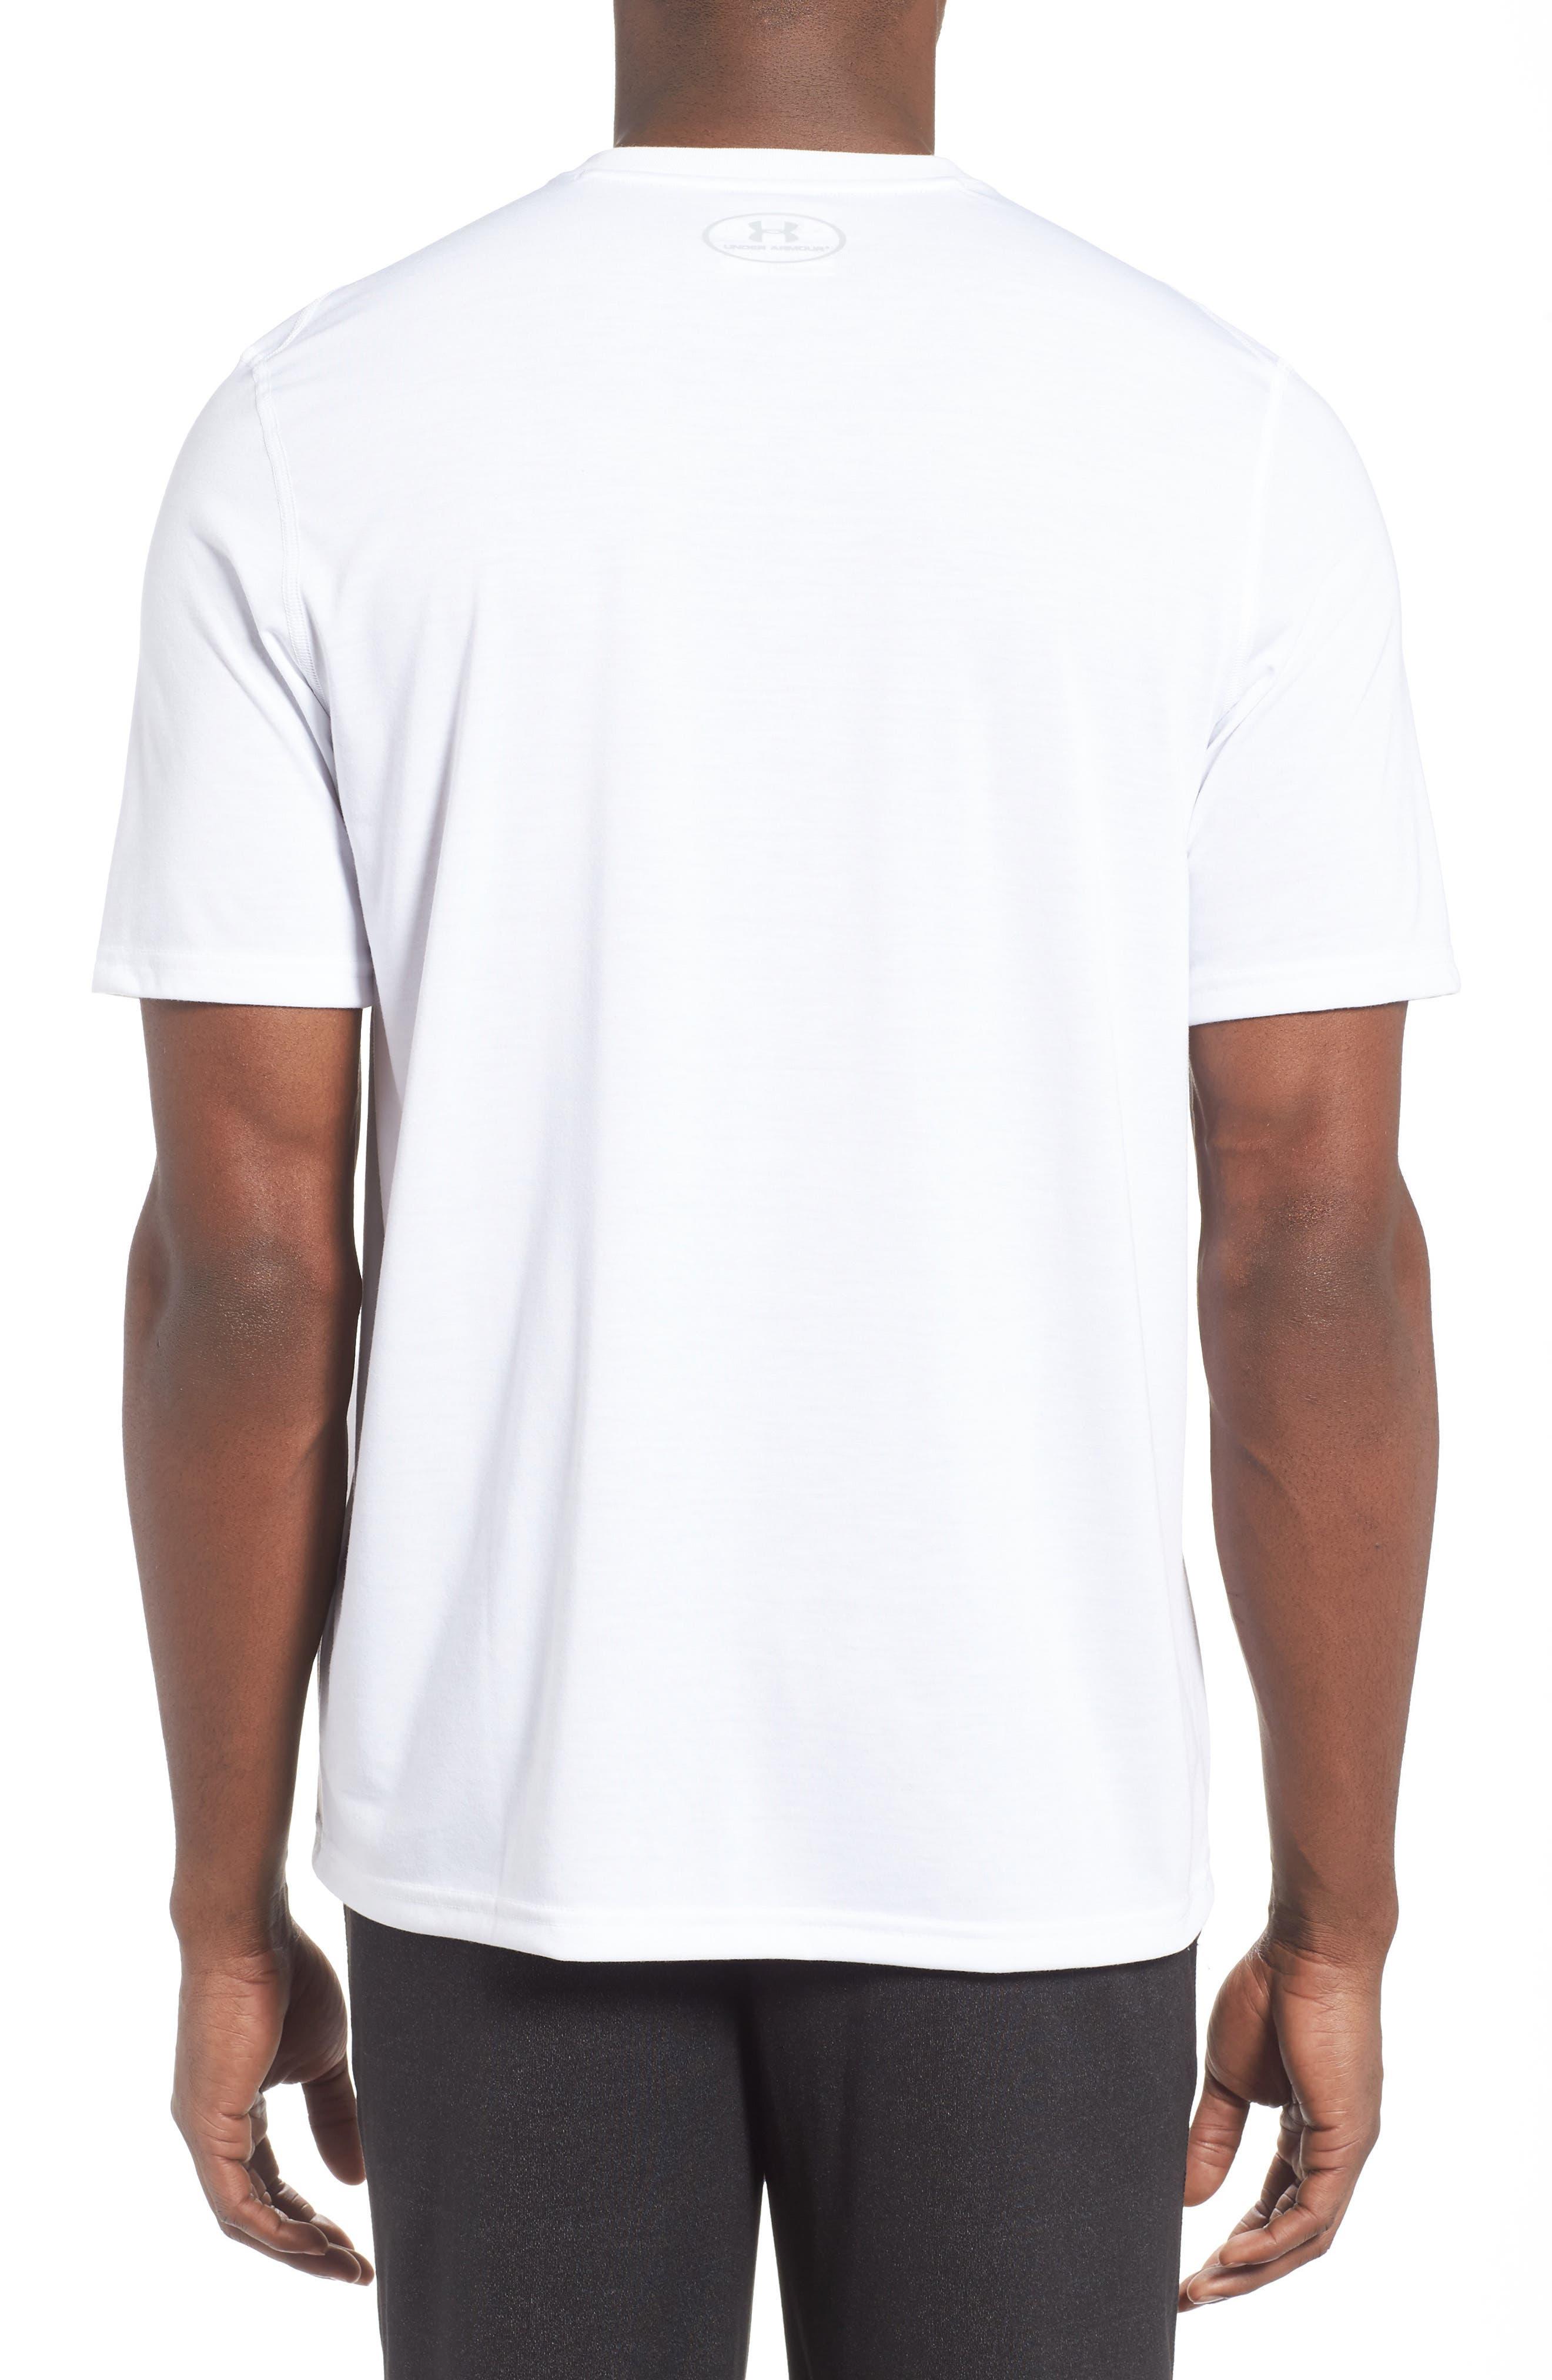 Alternate Image 3  - Under Armour Regular Fit Threadborne T-Shirt